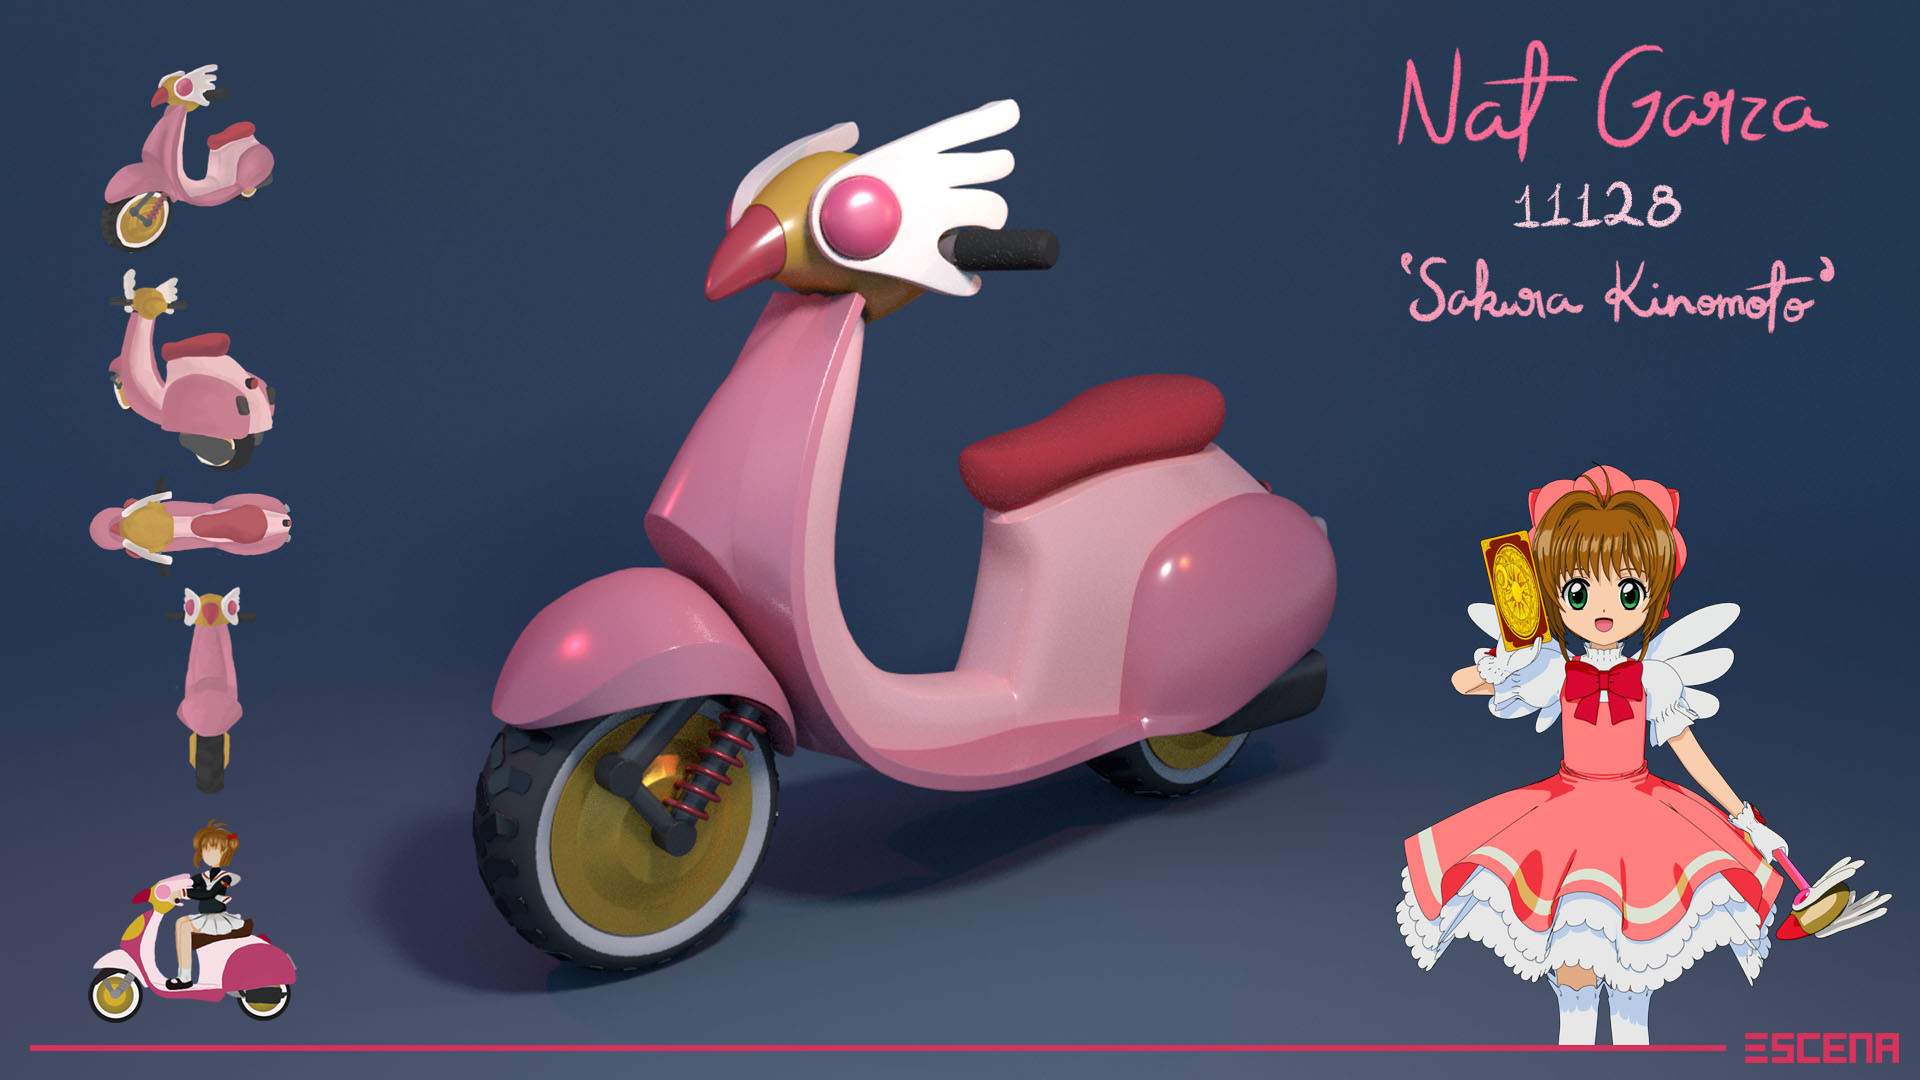 kart naf ArtStation   Sakura Kinomoto Mario Kart Scooter, Nat Garza kart naf